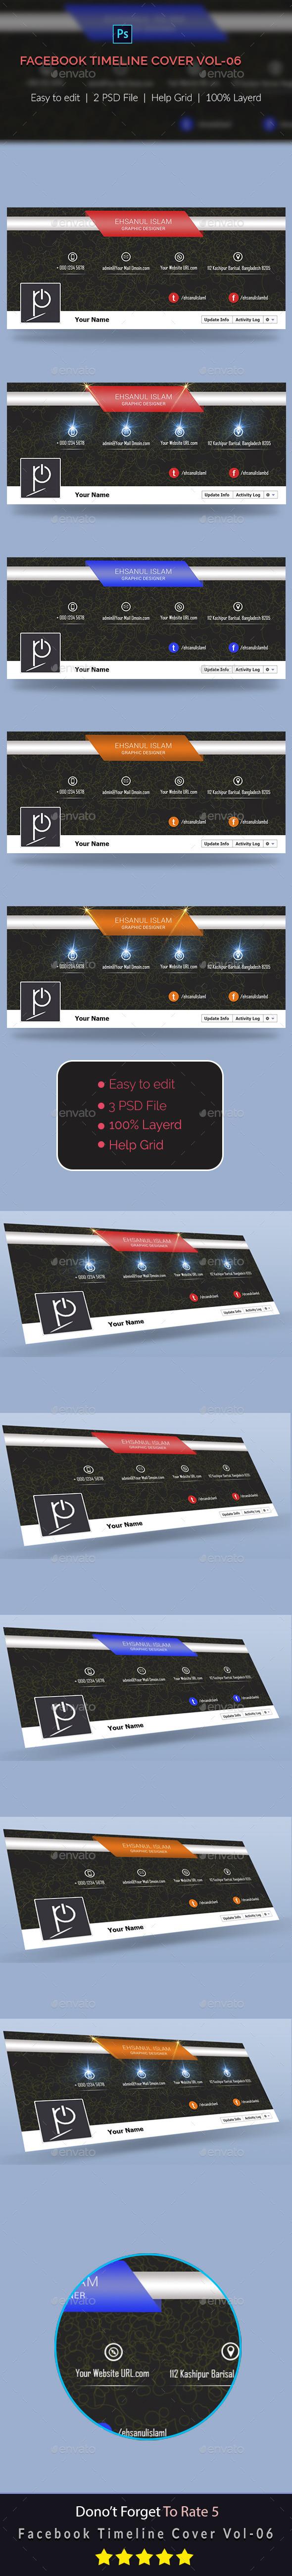 GraphicRiver Facebook Timeline Cover Vol-06 10018351